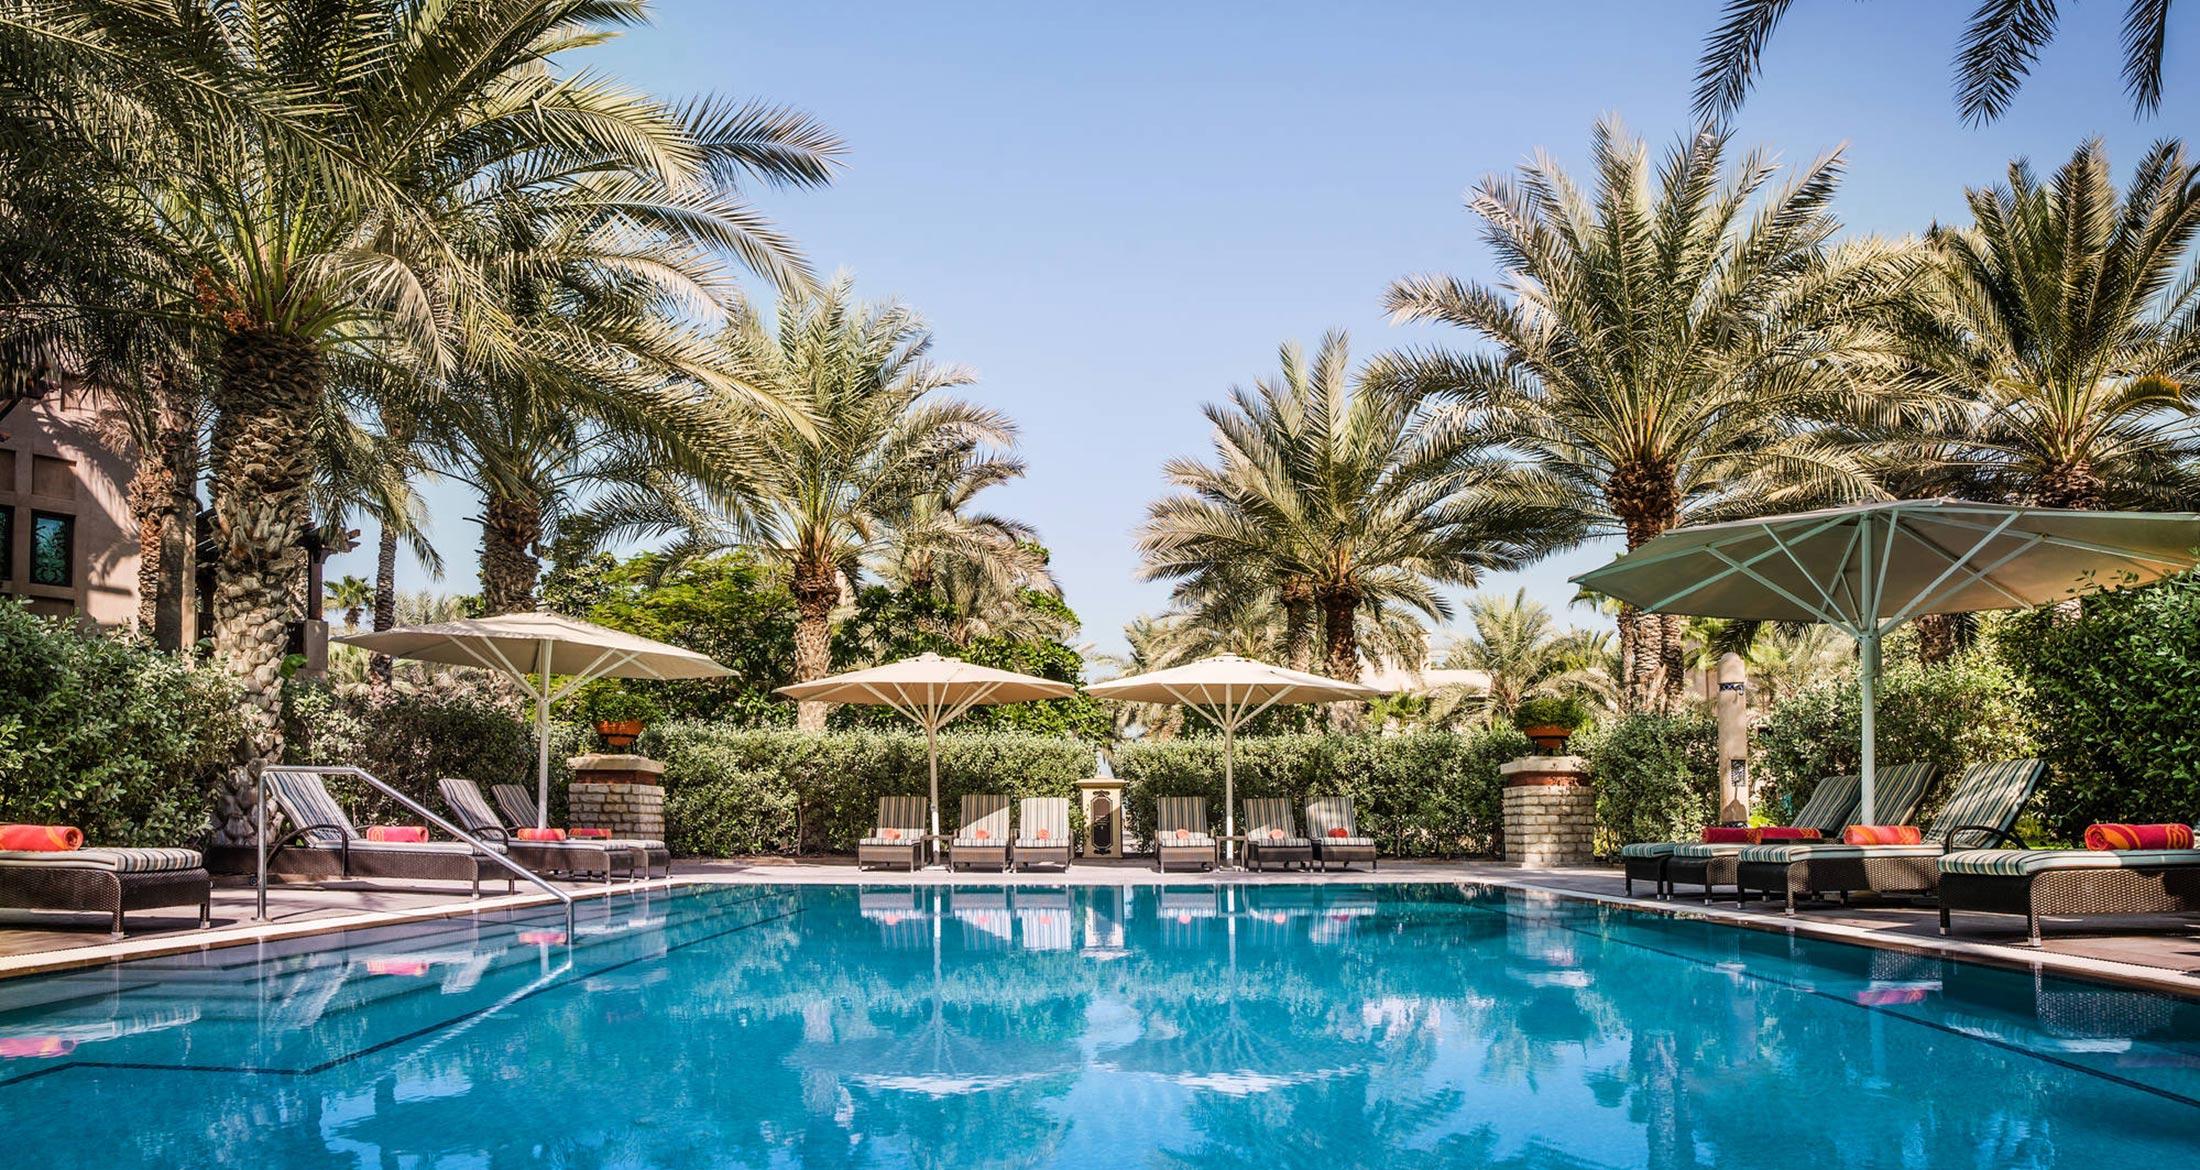 Jumeirah-Dar-Al-Masyaf----Arabian-Summerhouse-Private-Pool.jpg